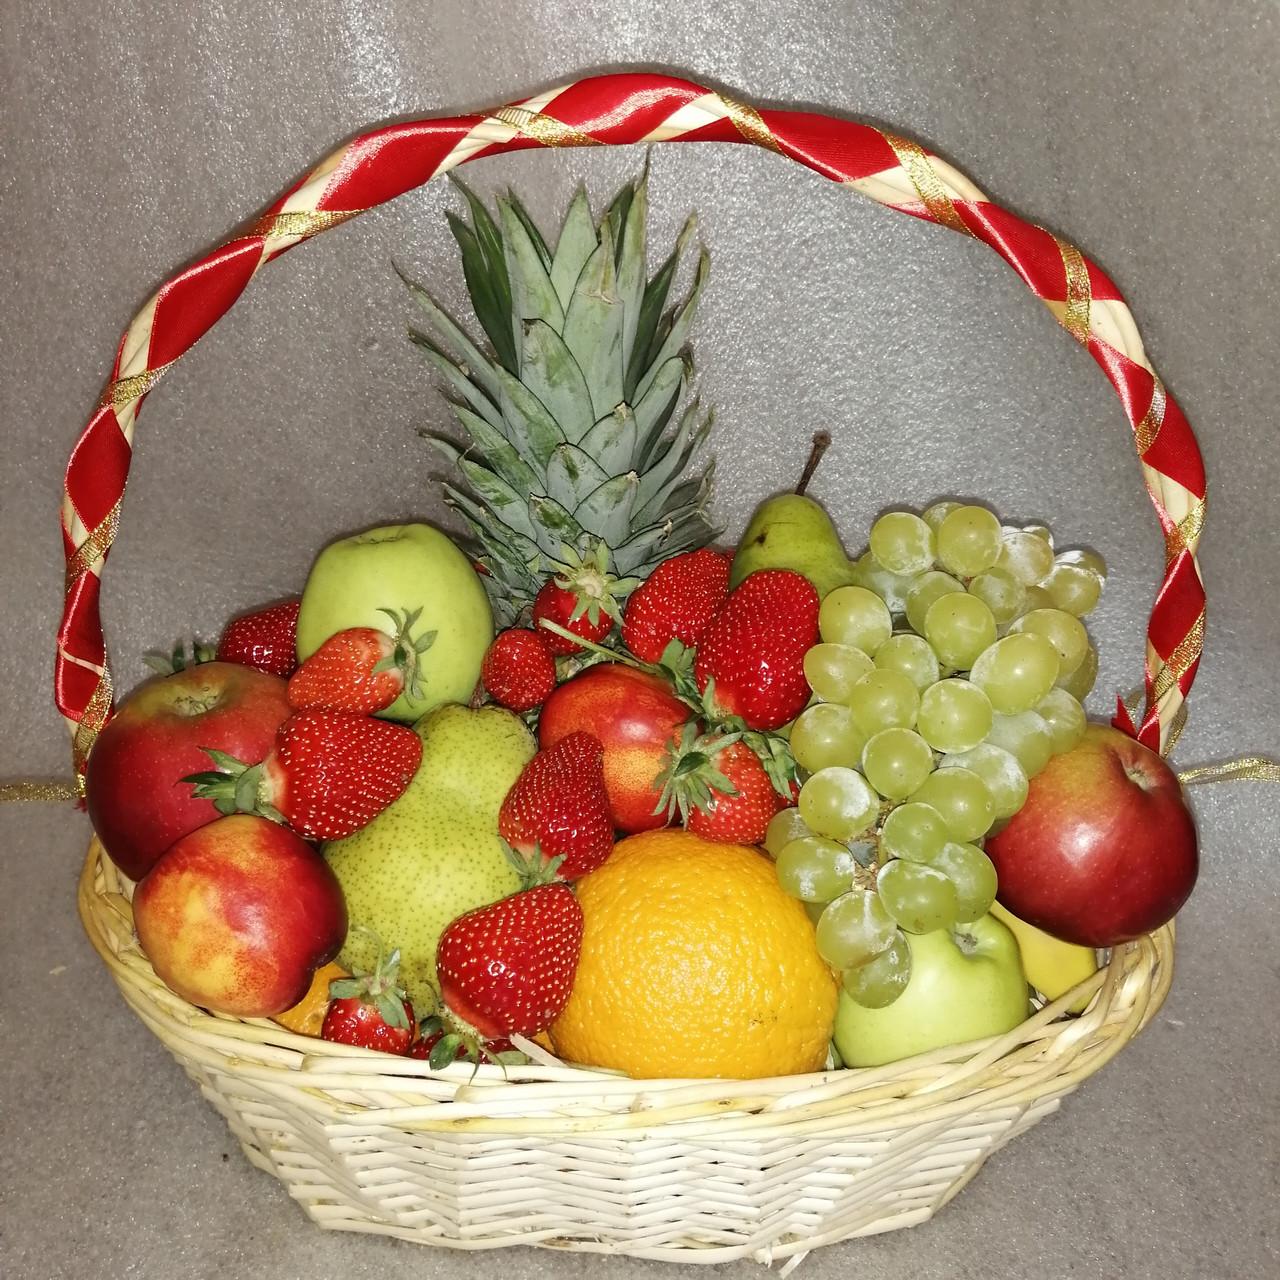 Кошик фруктовий подарунковий  вітальний з ананасом виноградом полуницею апельсинами грушами персиками